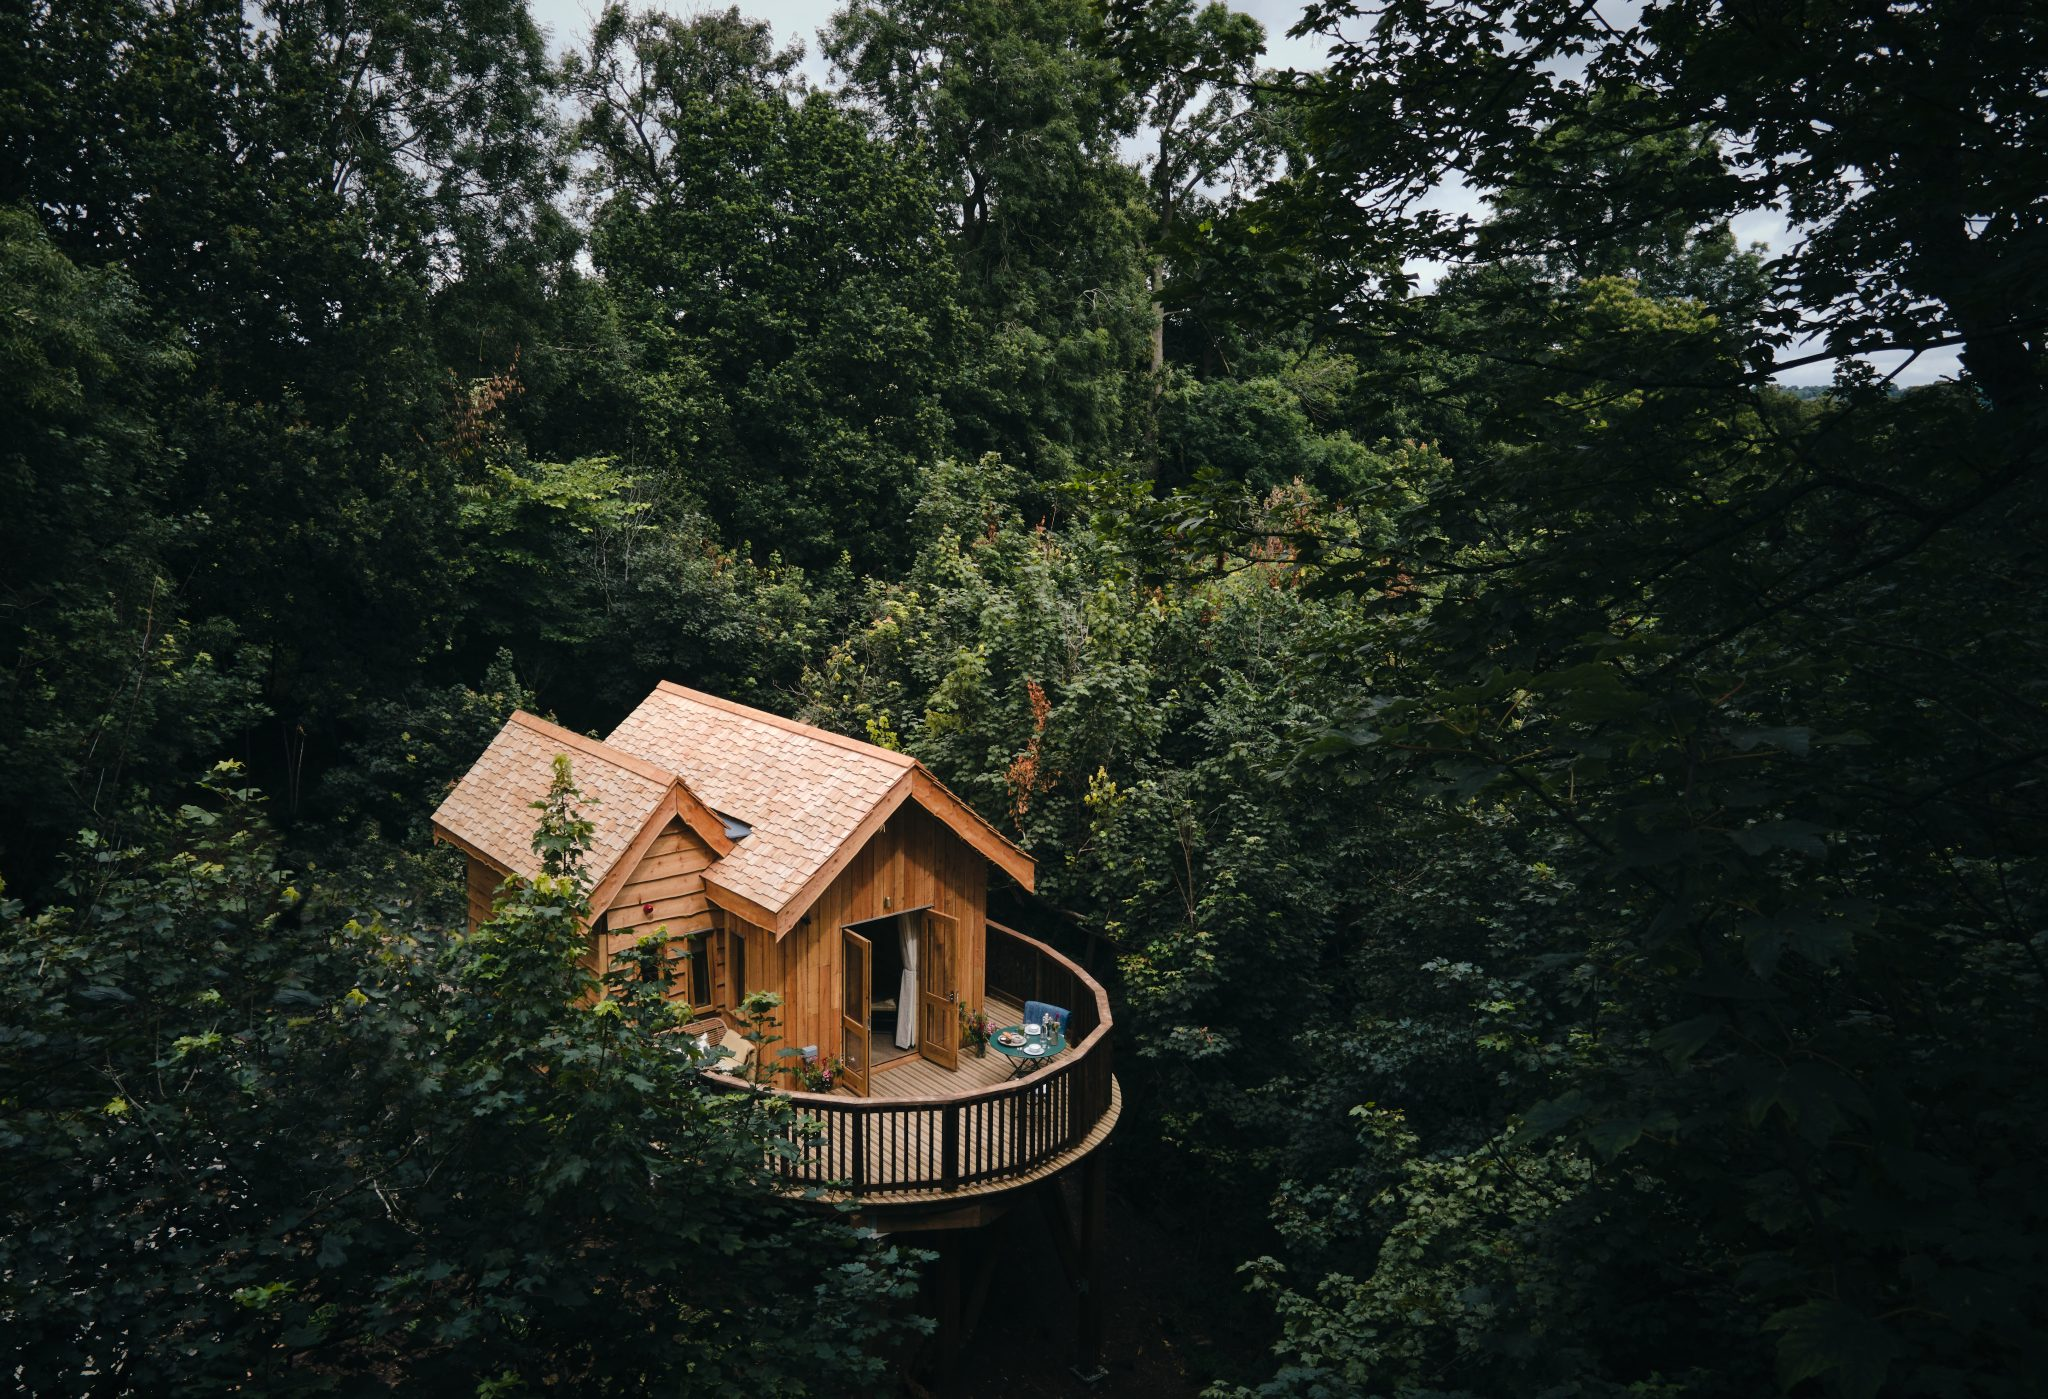 Callow Hall treehouse